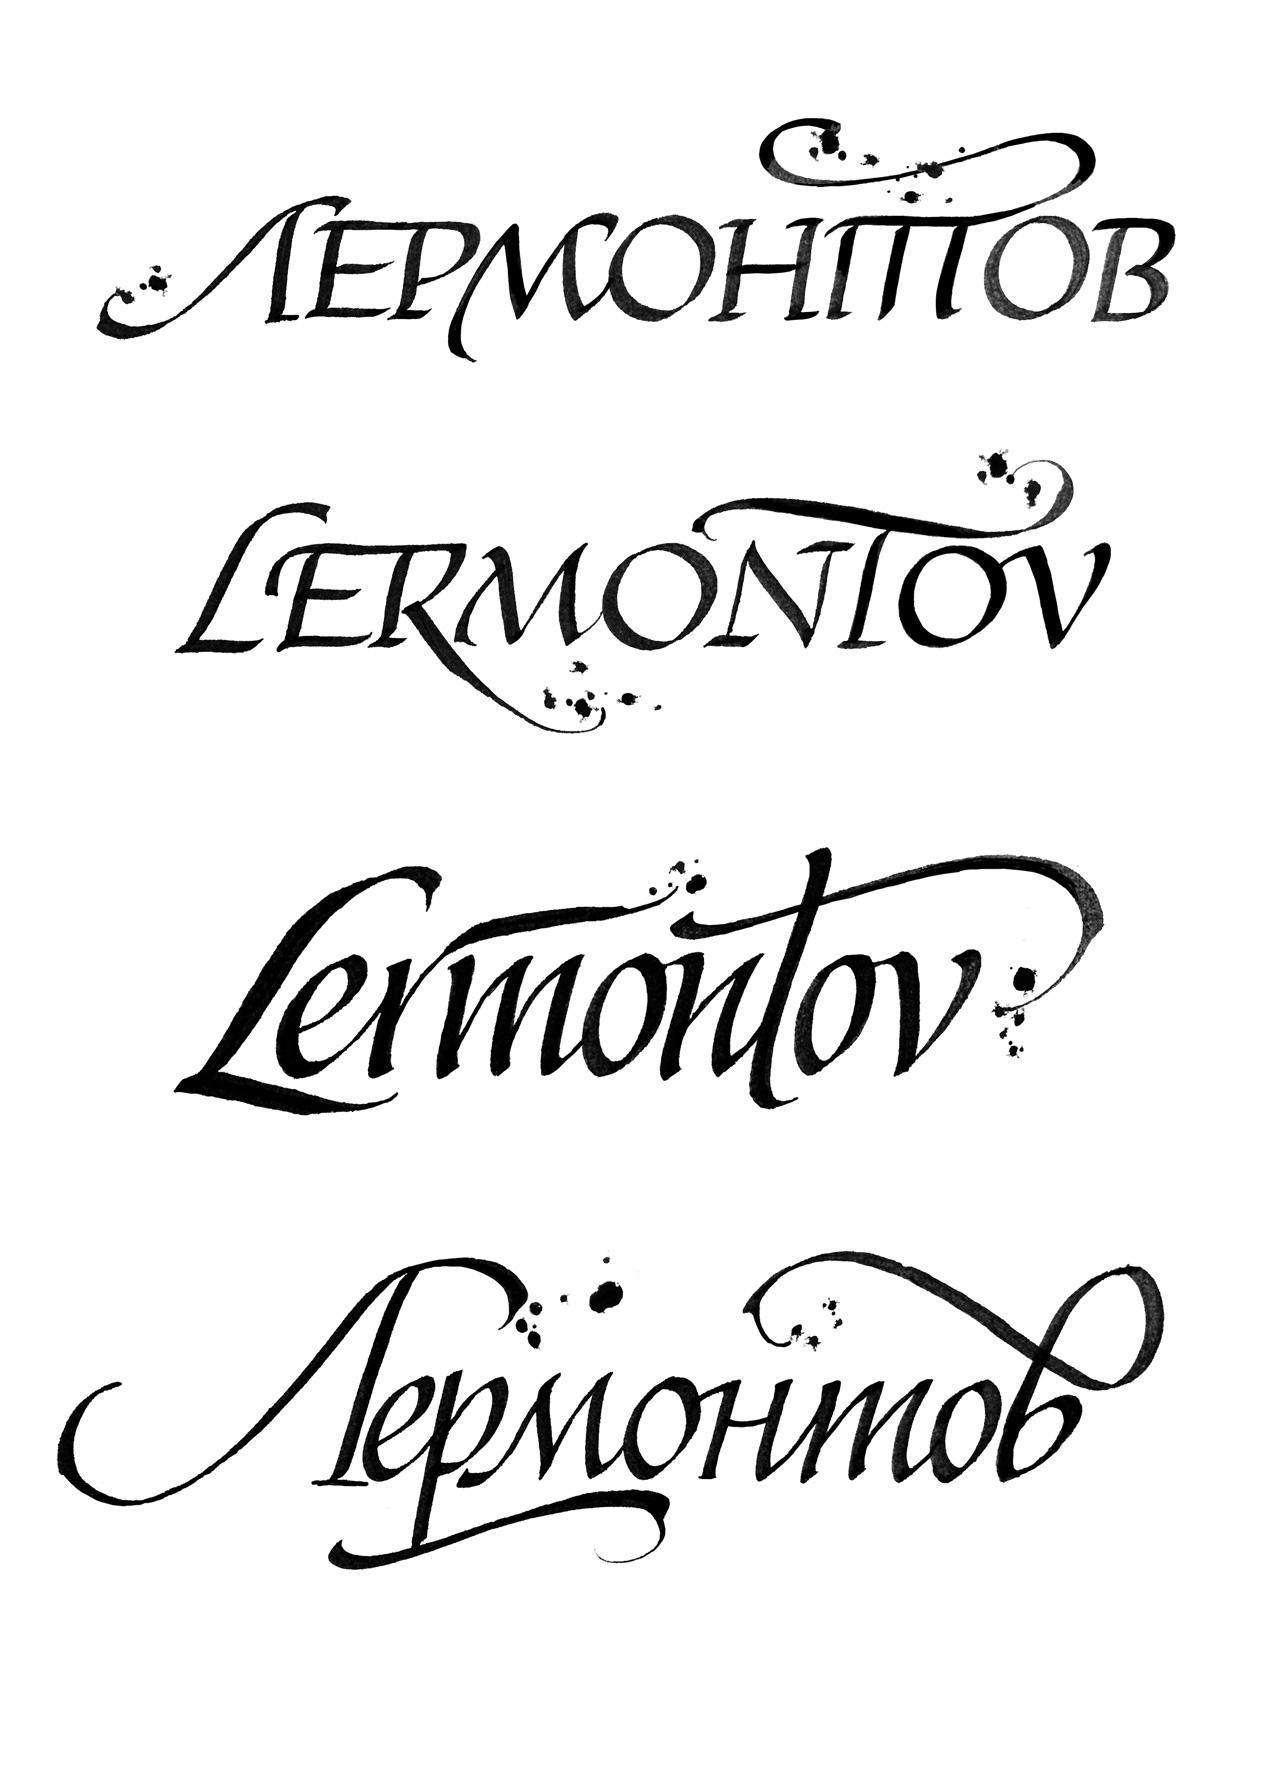 Lermontov_title_1